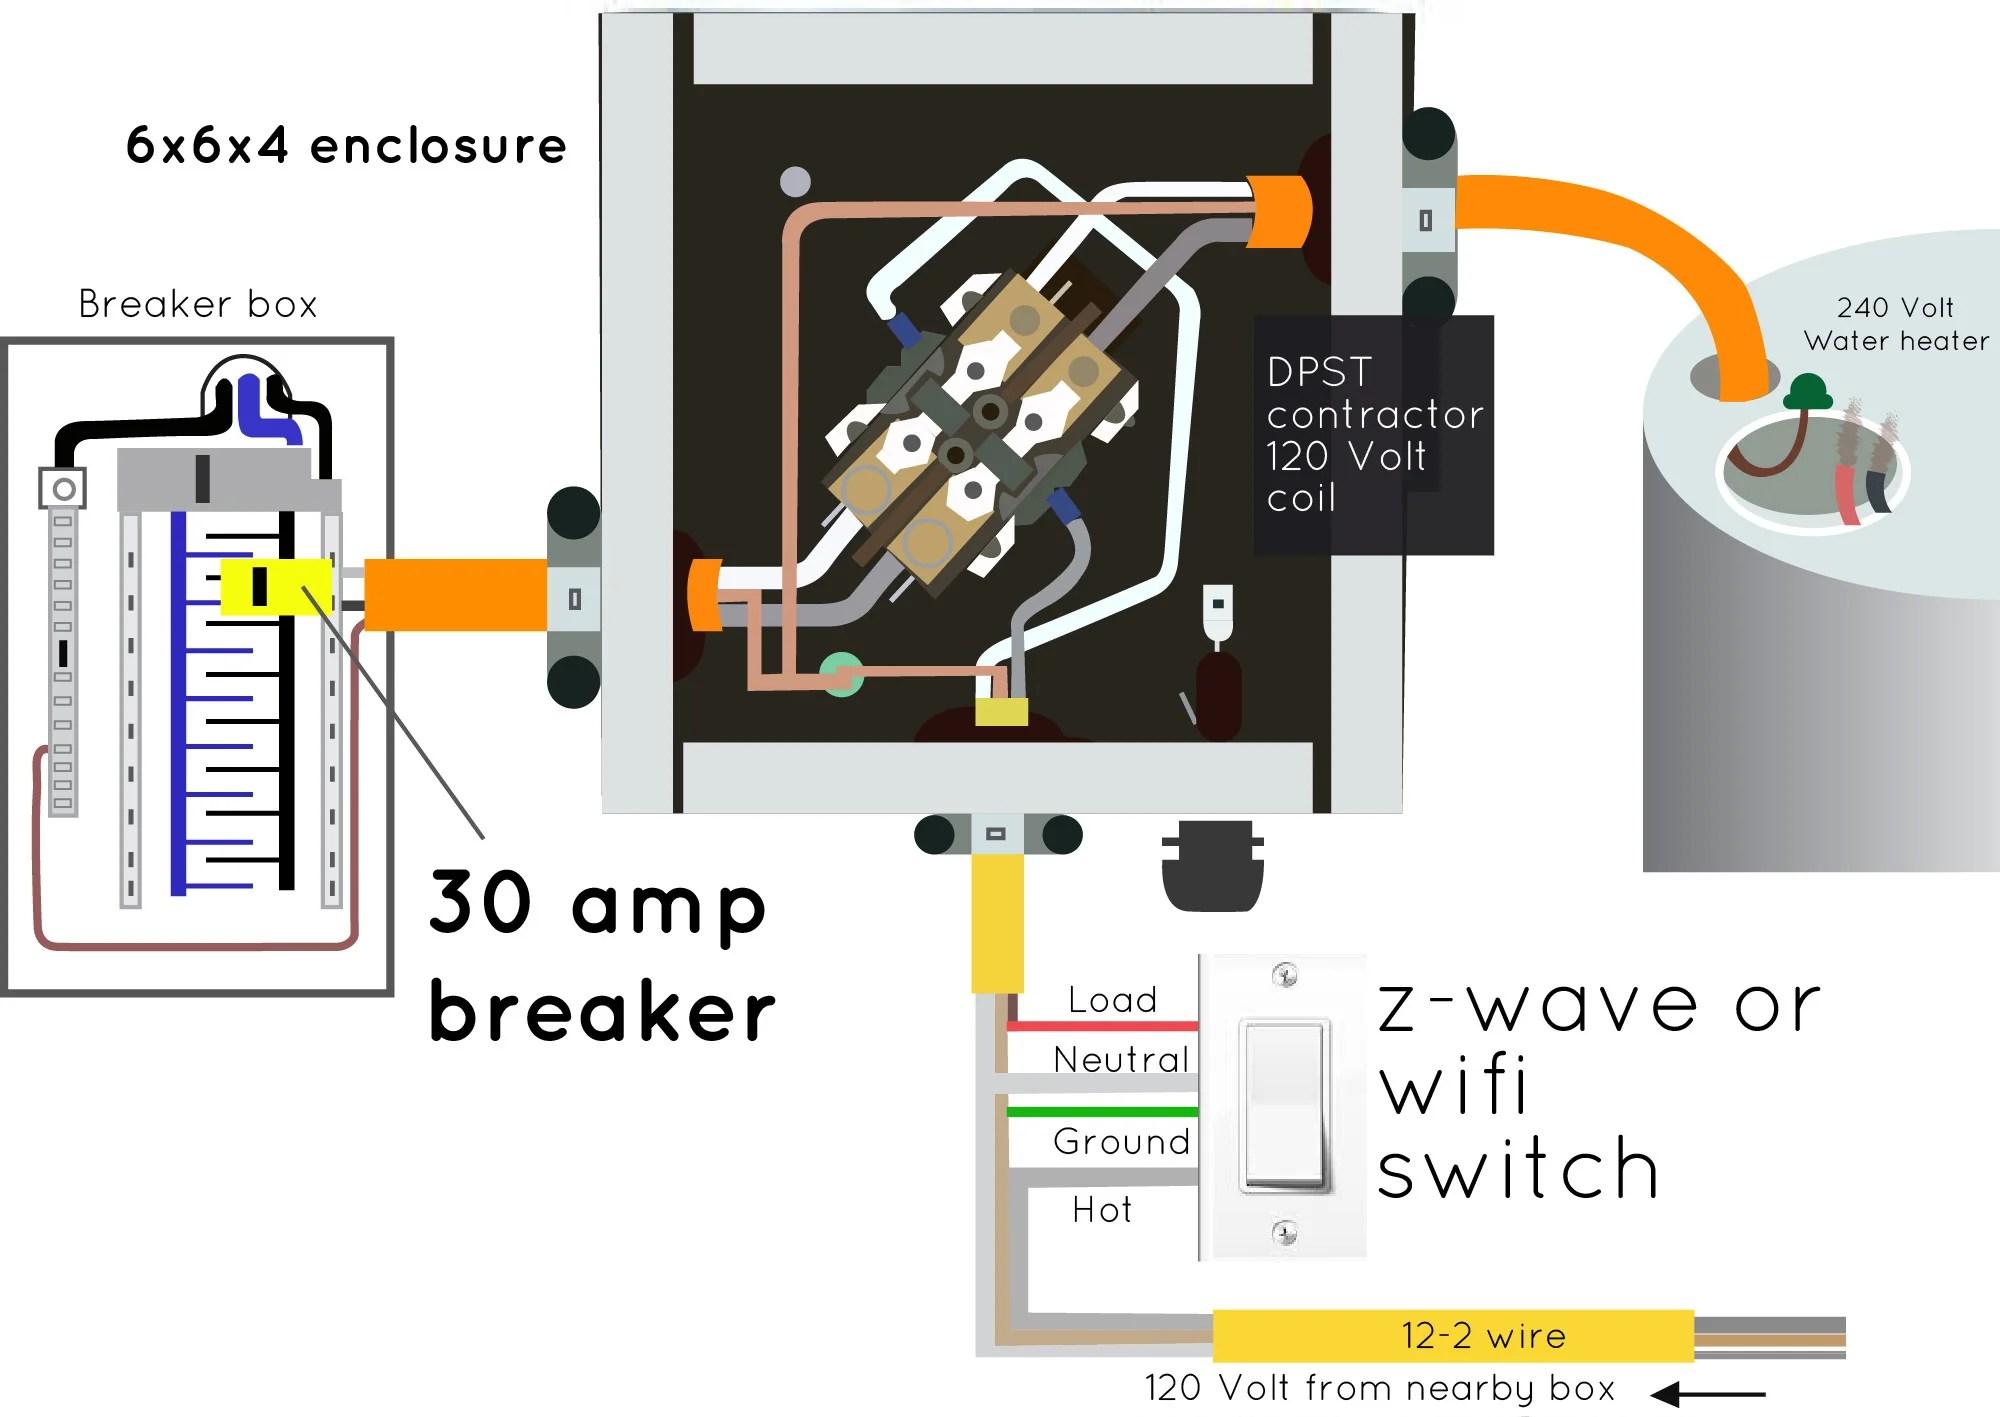 120 volt contactor wiring wiring diagram tutorial 240 vac contactor wiring [ 2000 x 1417 Pixel ]